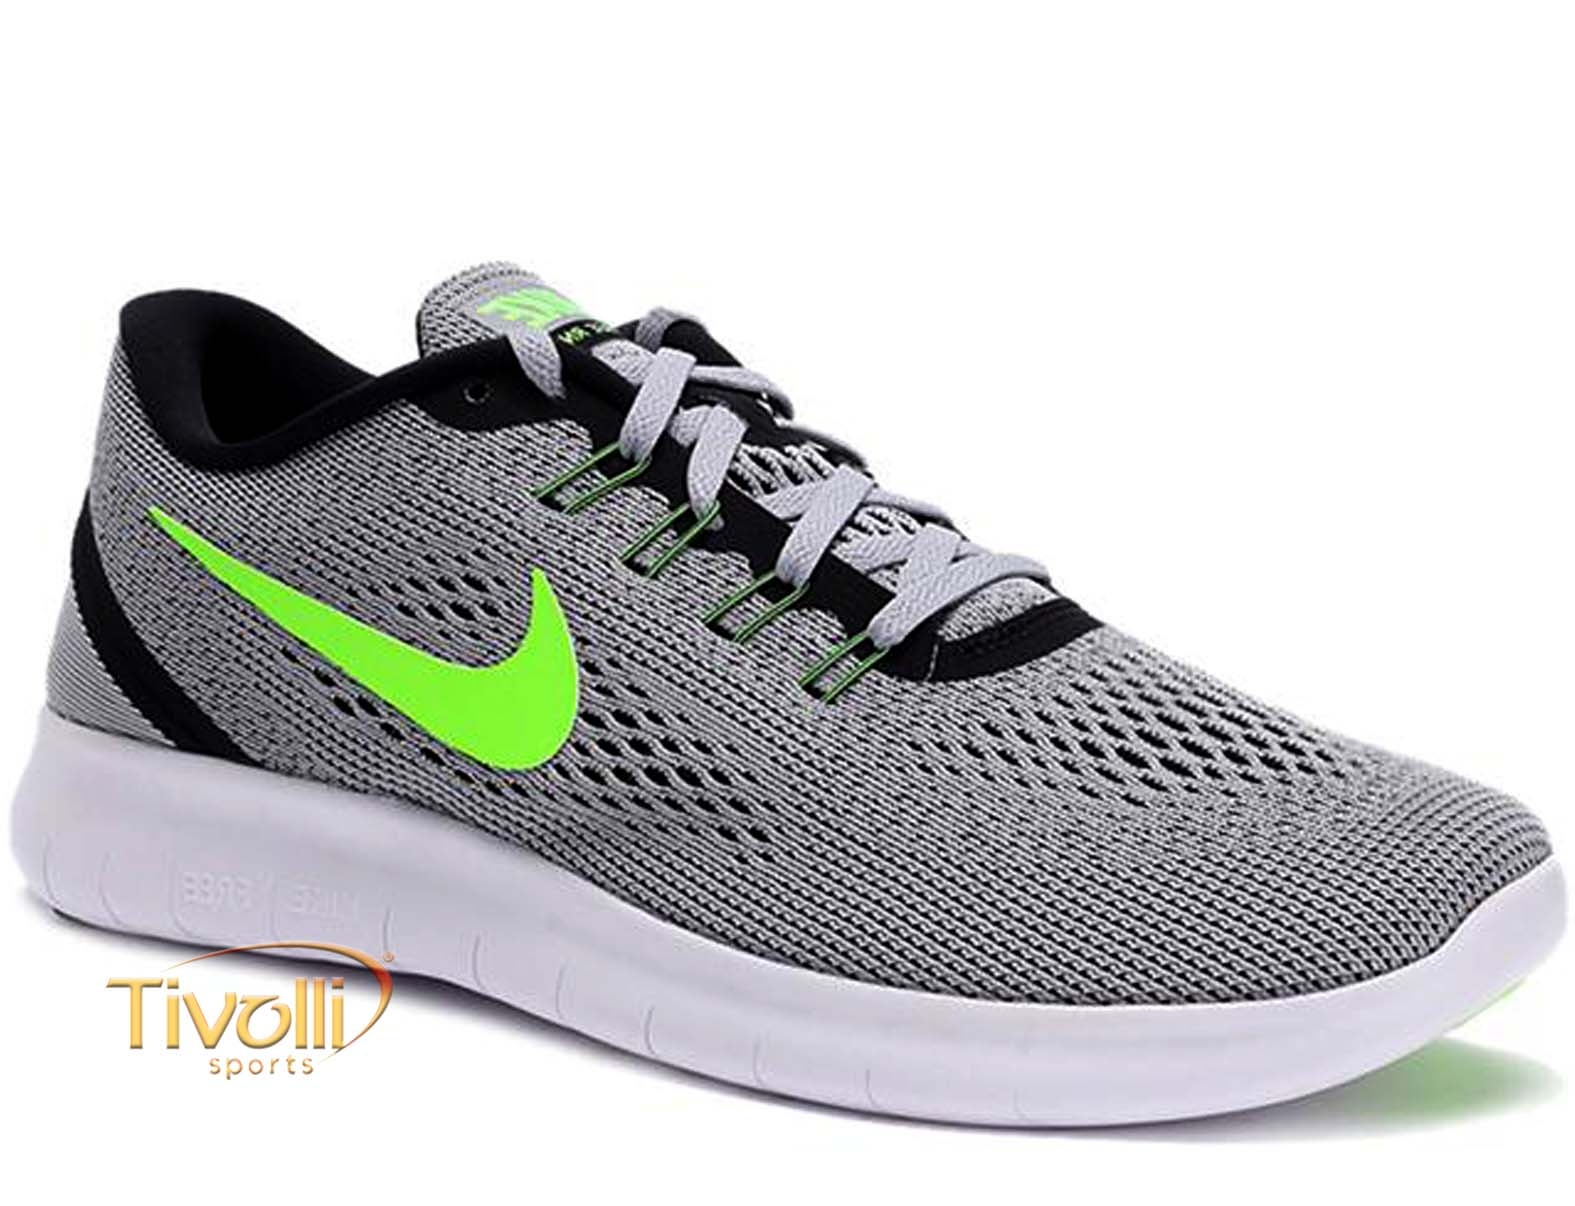 30726c714e6 Raquete Mania   Tênis Nike Free RN   Cinza Prata